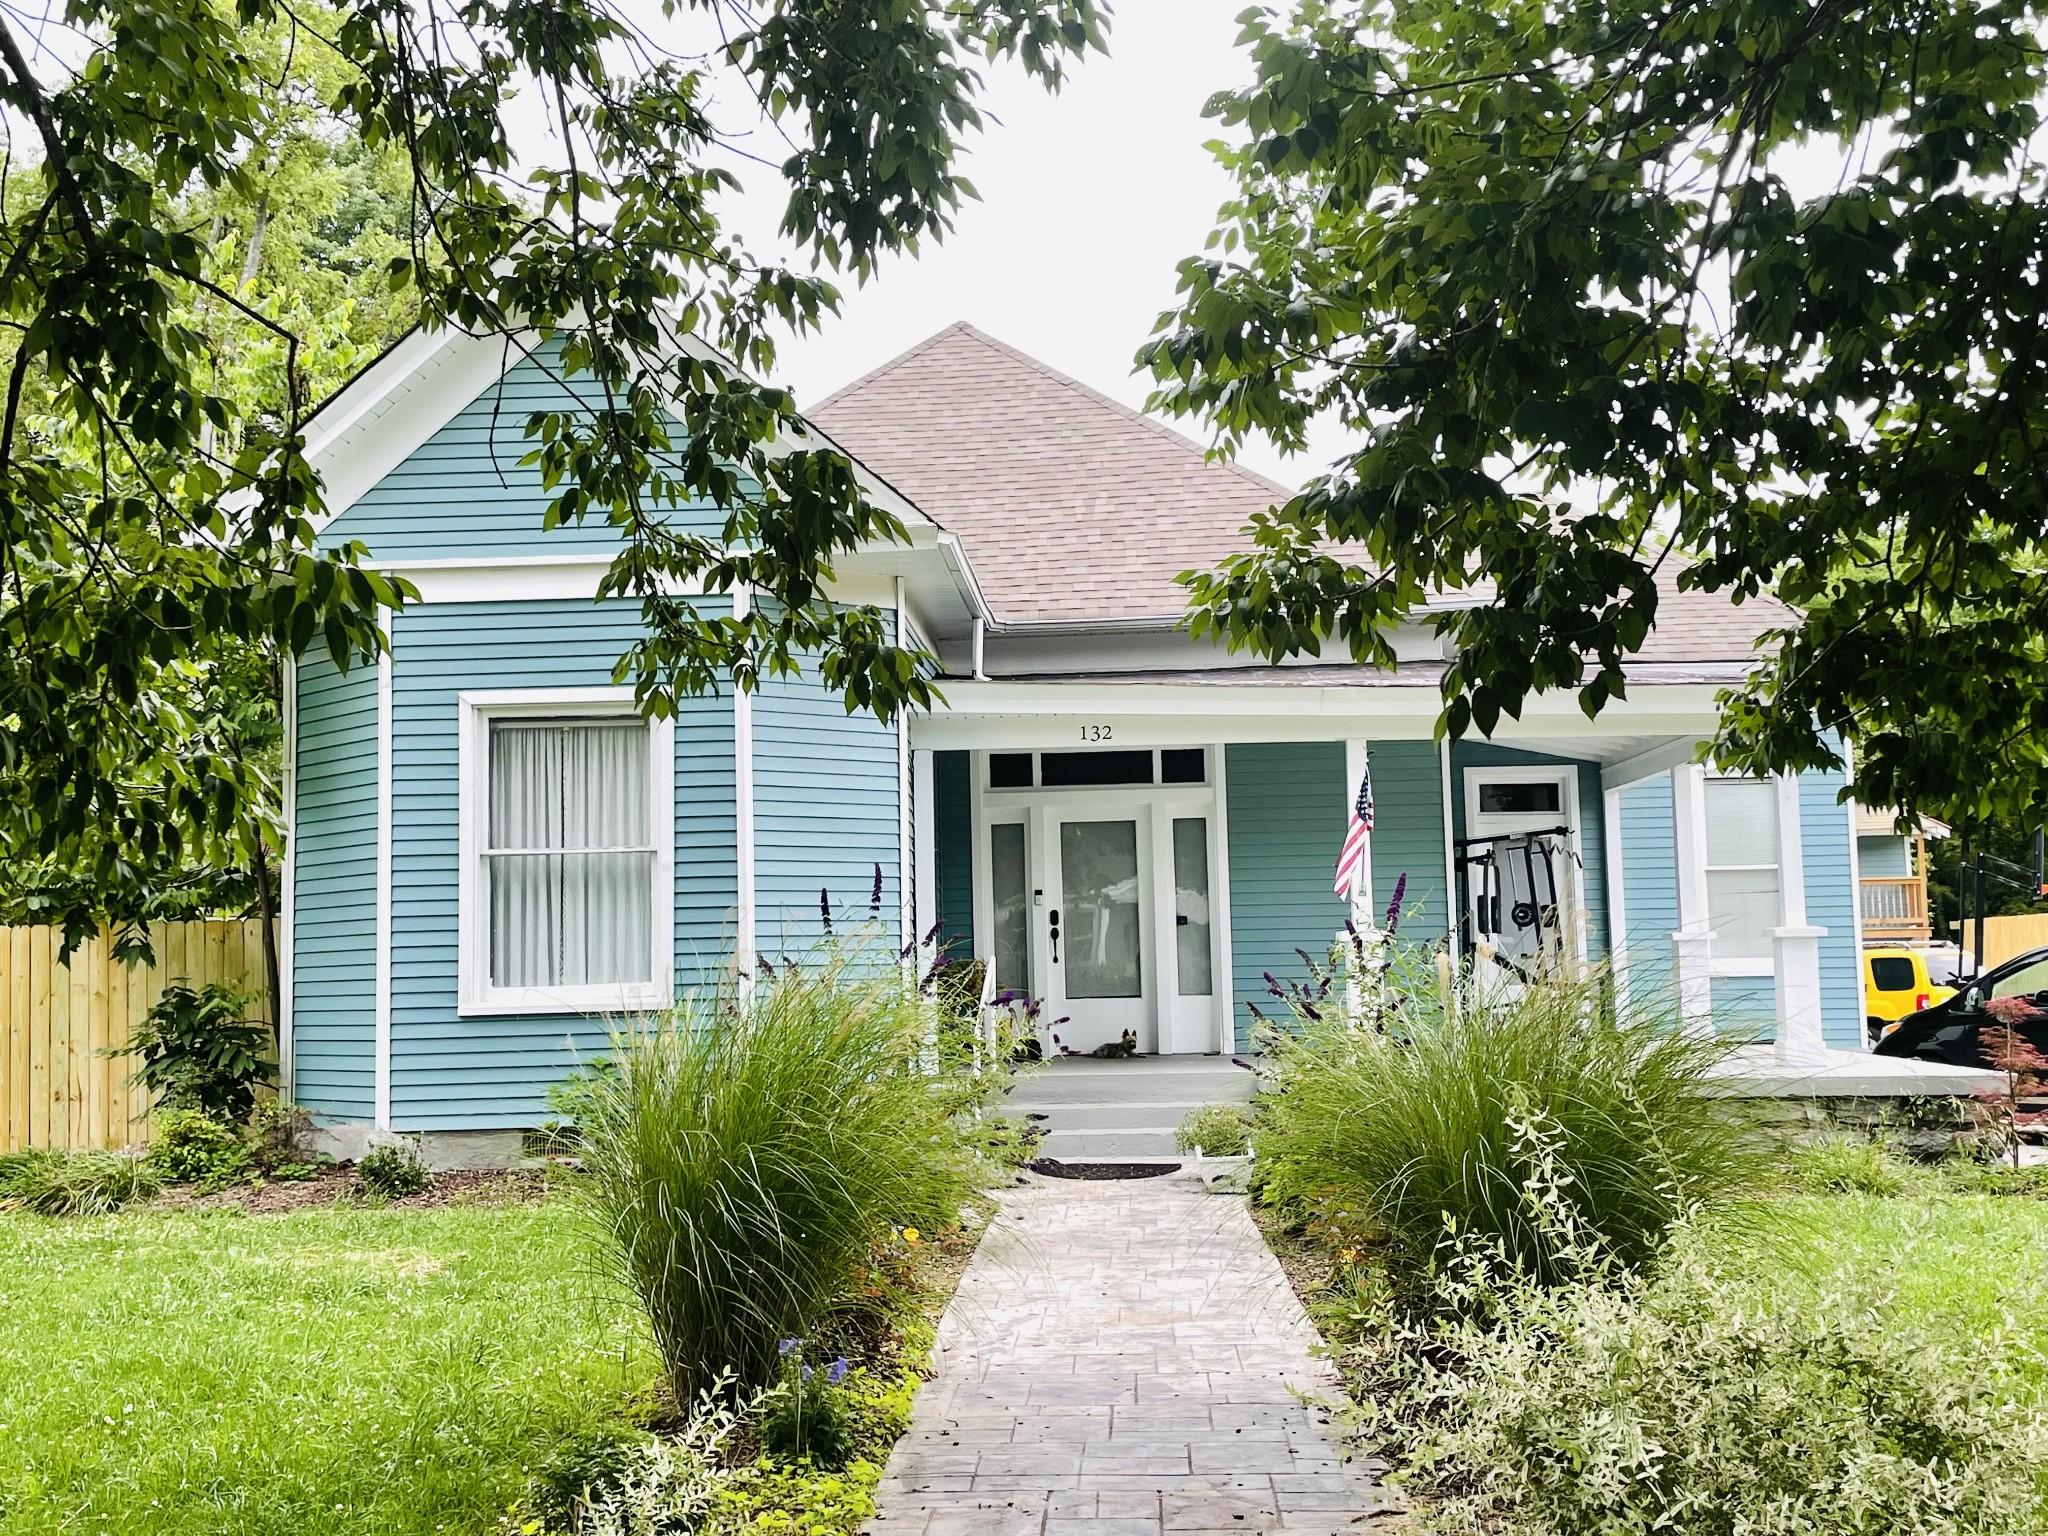 132 S Hatton Ave Property Photo 1